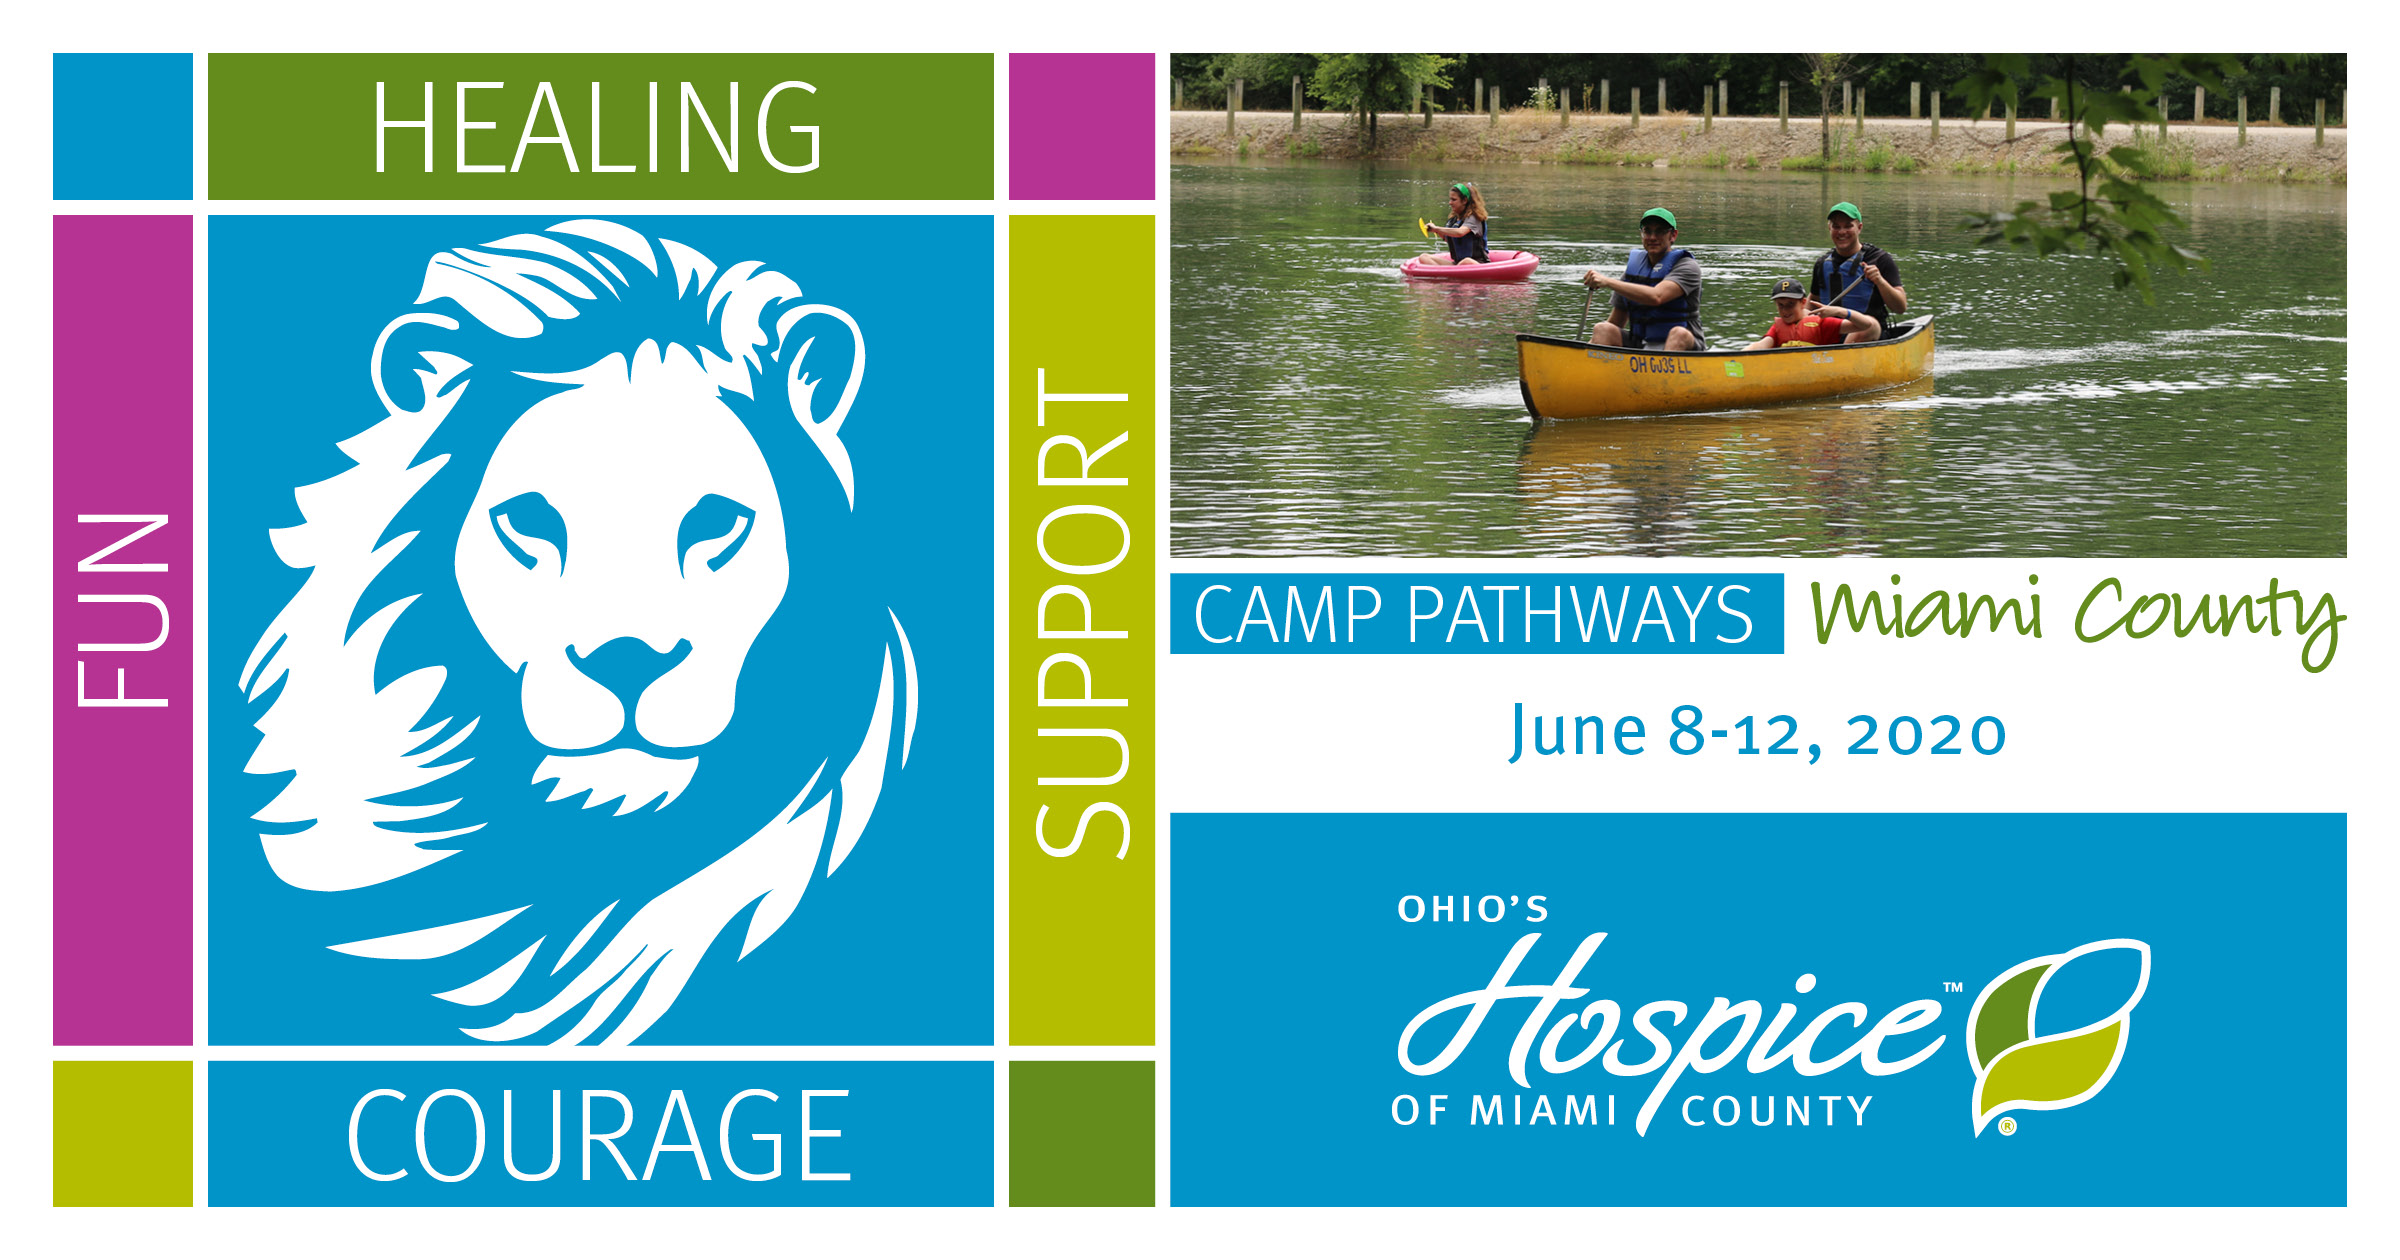 Camp Pathways: Miami County